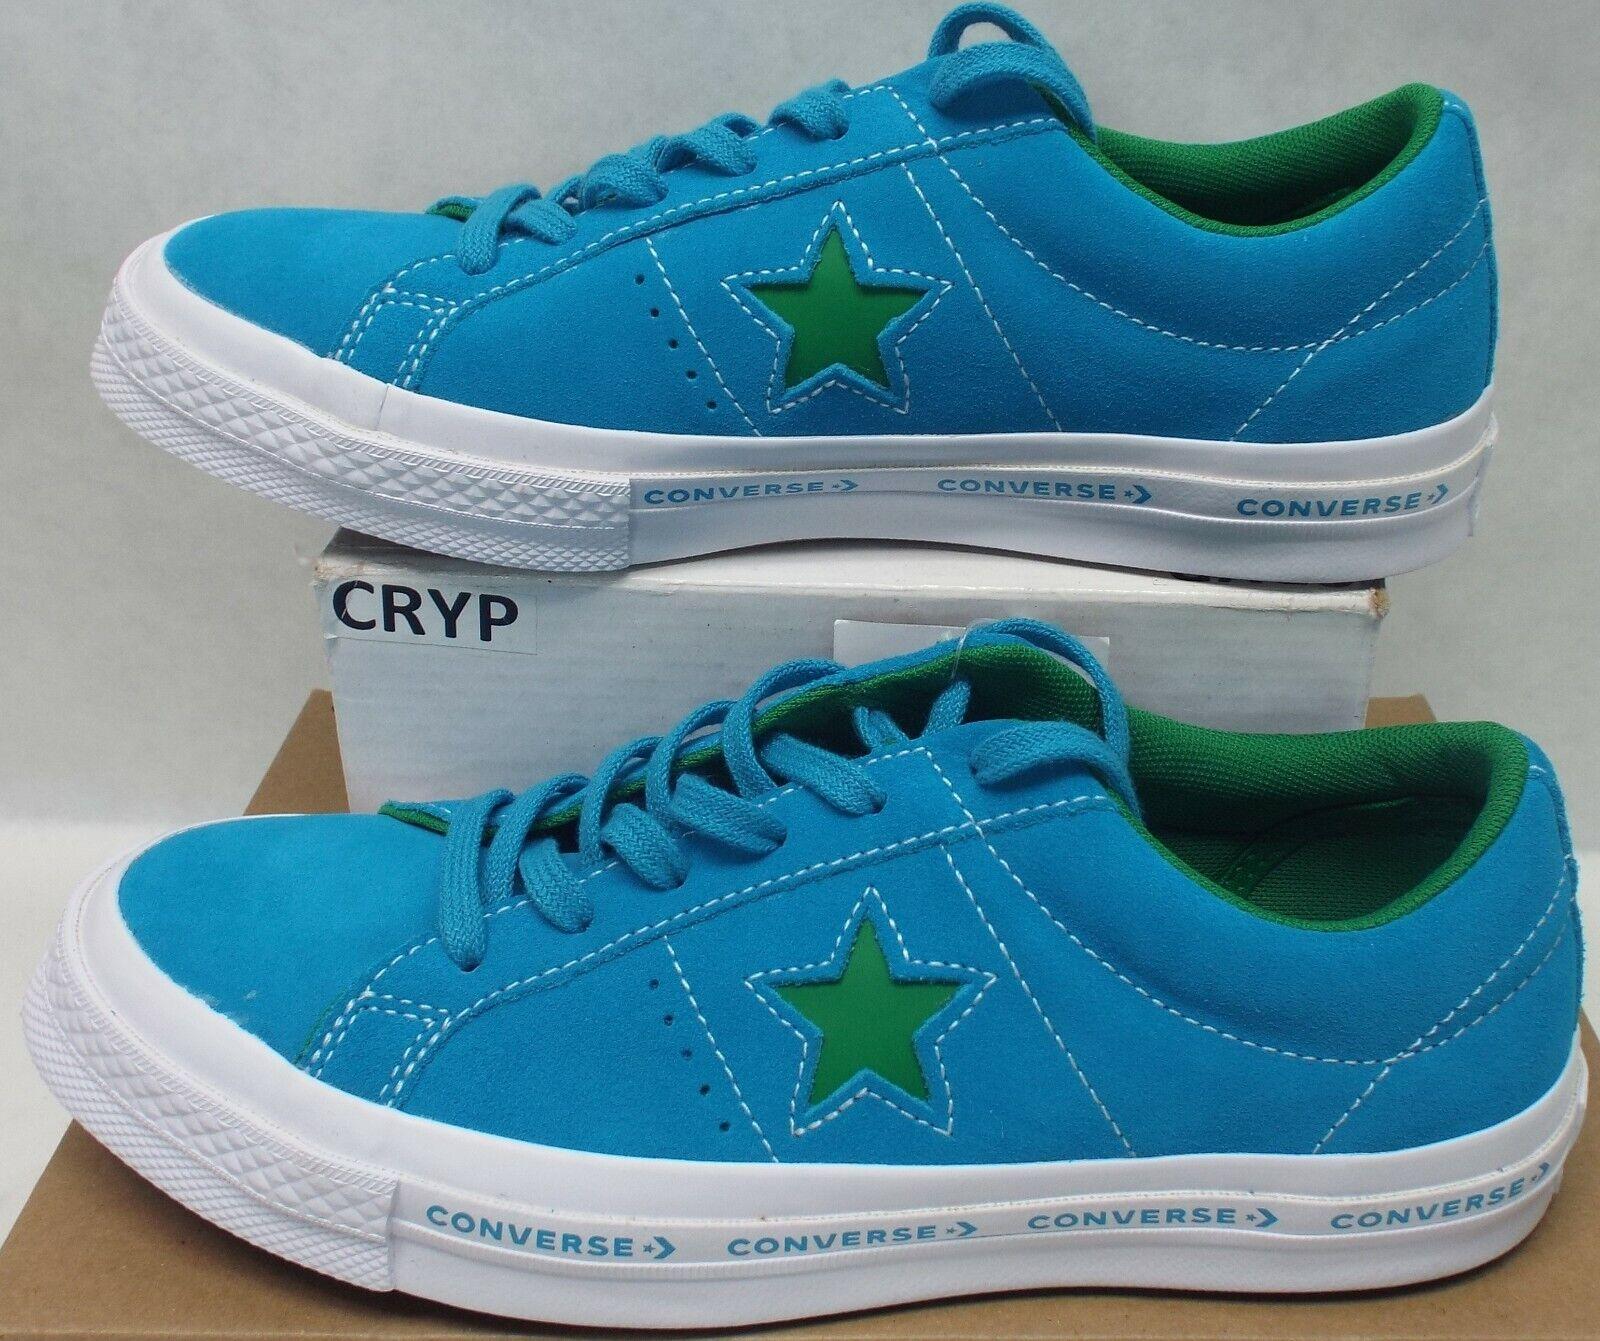 Homme 5.5 Femme 7.5 Converse One Star daim Ox Hawaiian Ocean Chaussures 80 259813   C